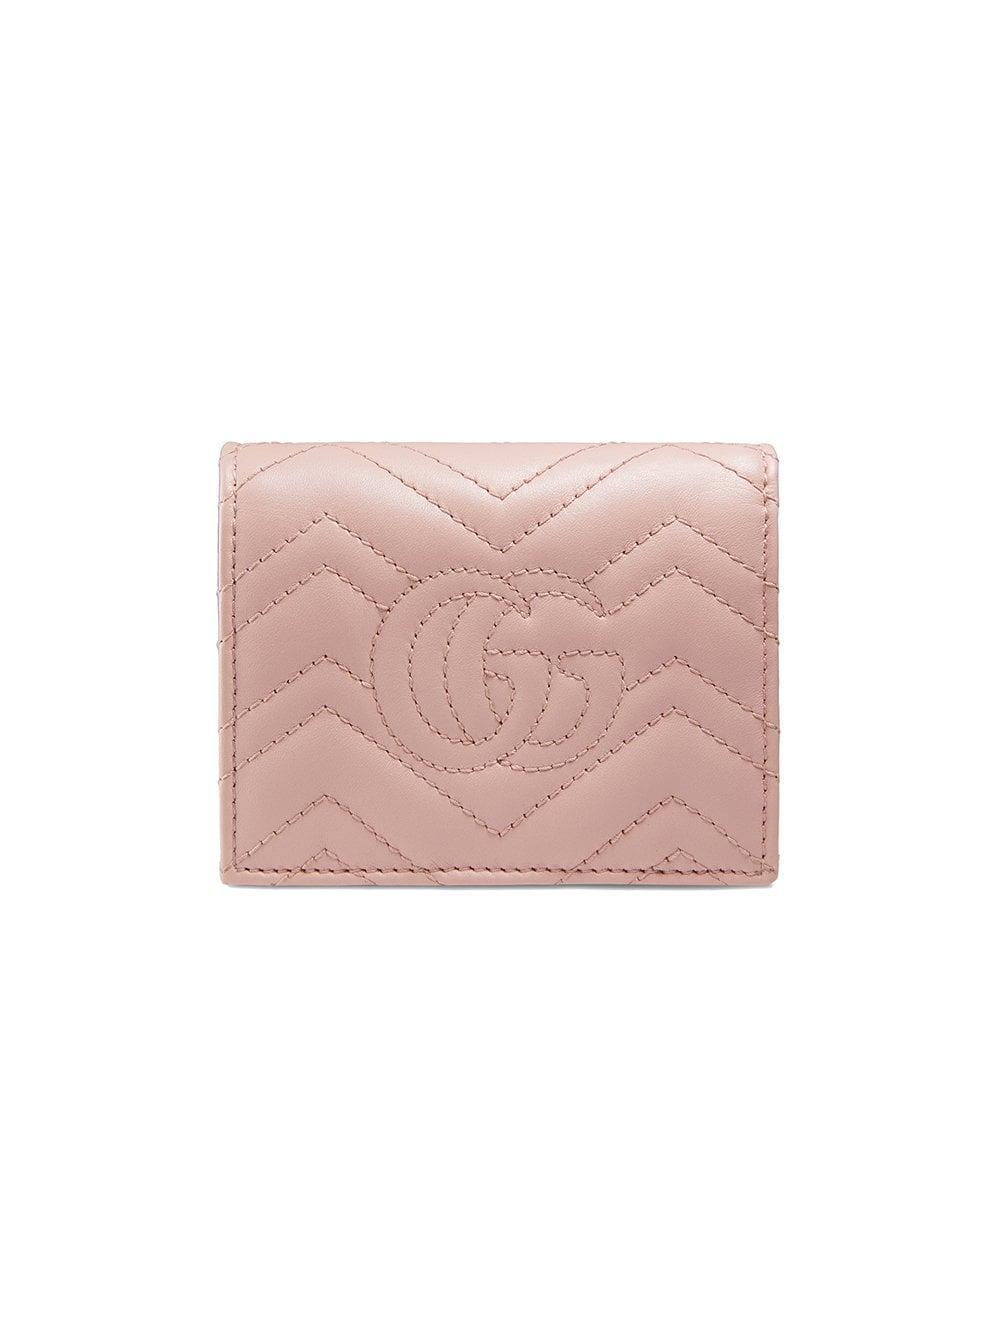 a05c13348b8d8a Gucci - Pink GG Marmont Card Case - Lyst. View fullscreen